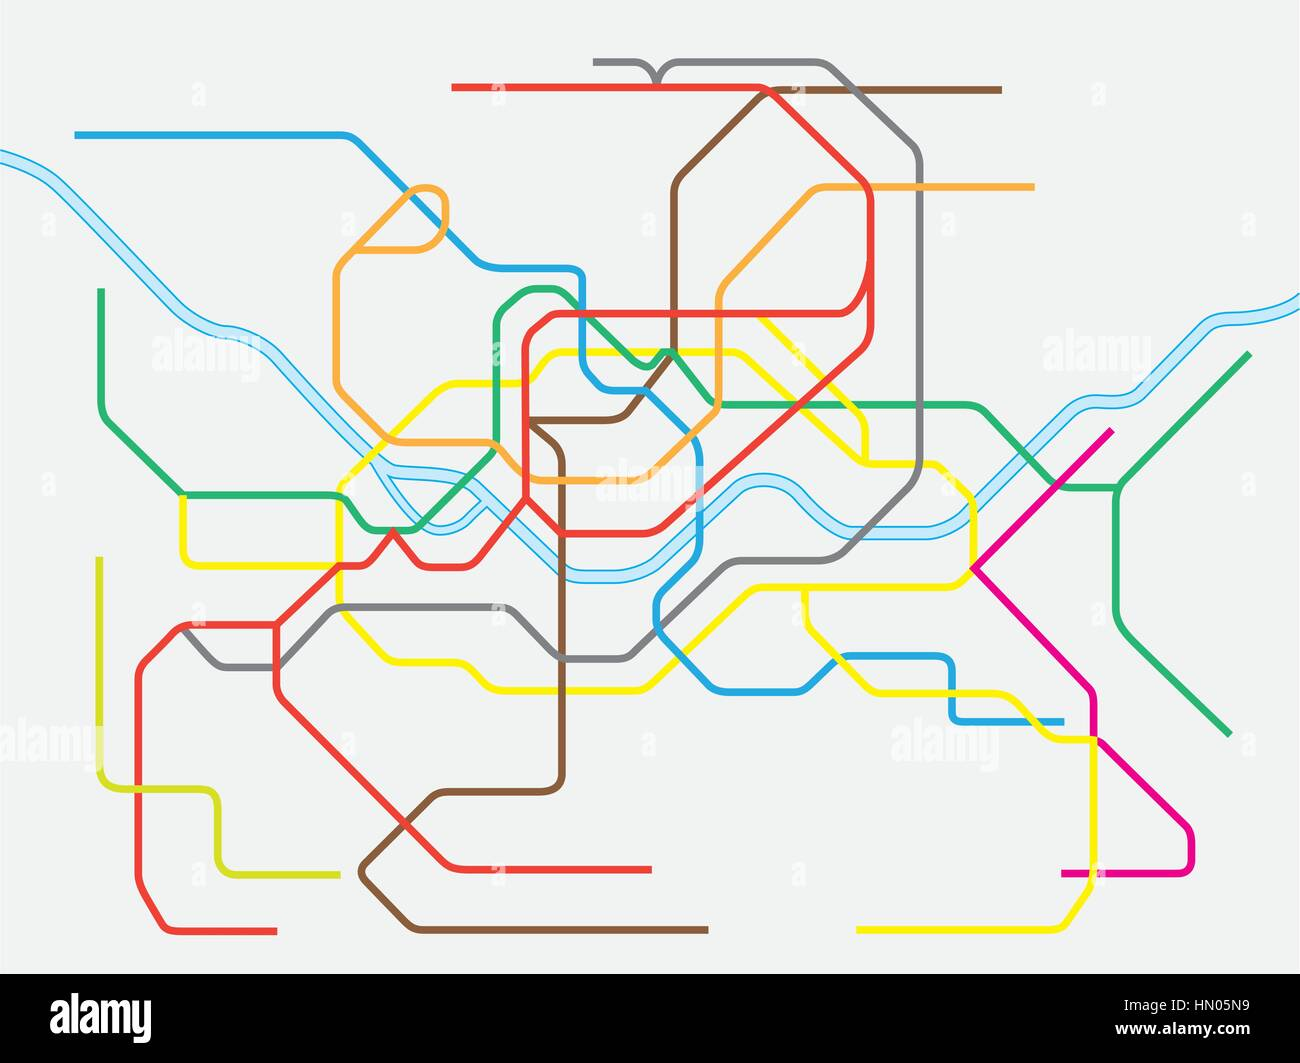 Seoul Metropolitan Subway Map Download.Colorful Seoul Metropolitan Subway Map Eps Stock Vector Art